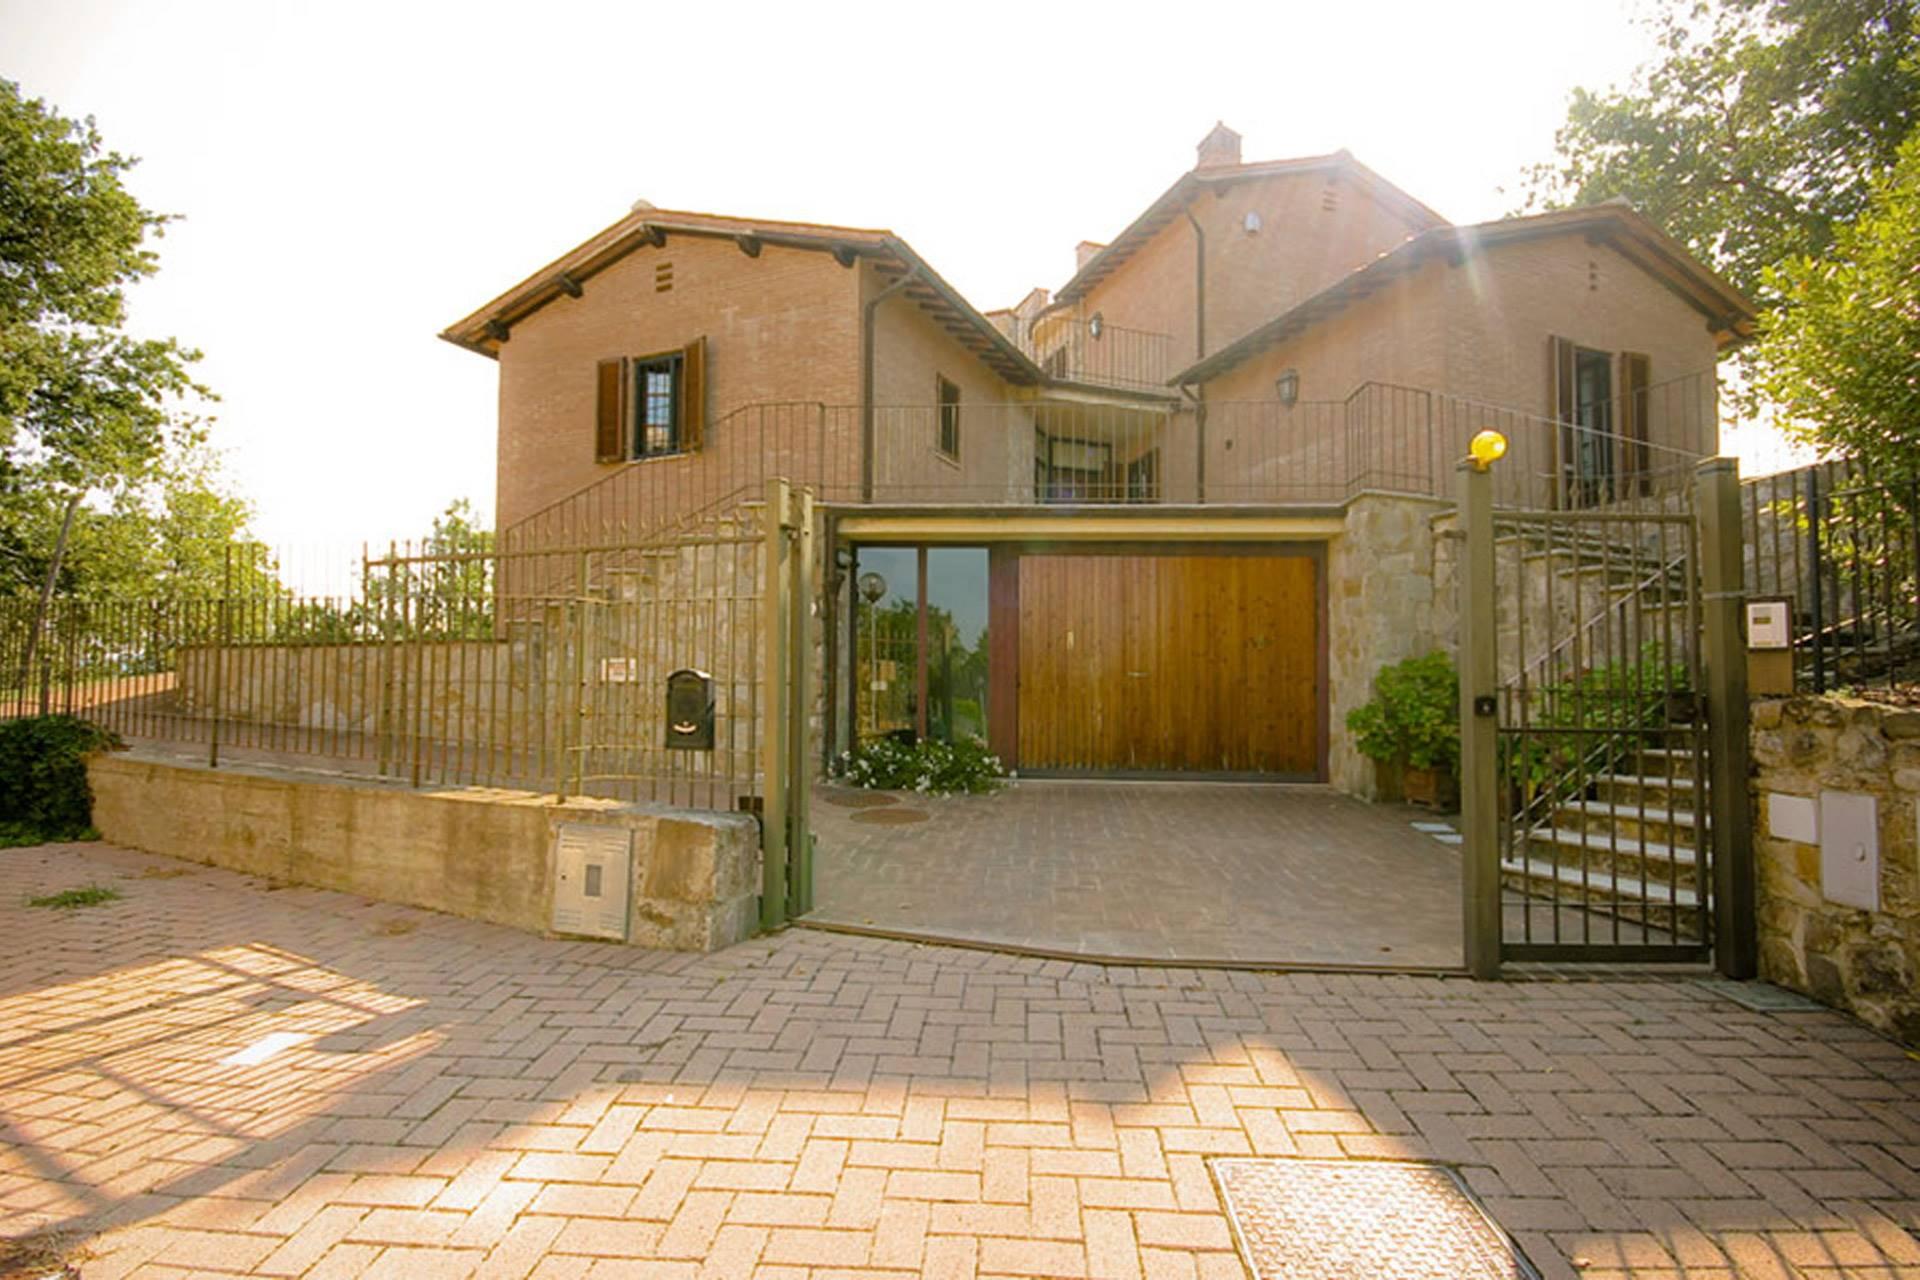 3685 villa lato ingresso